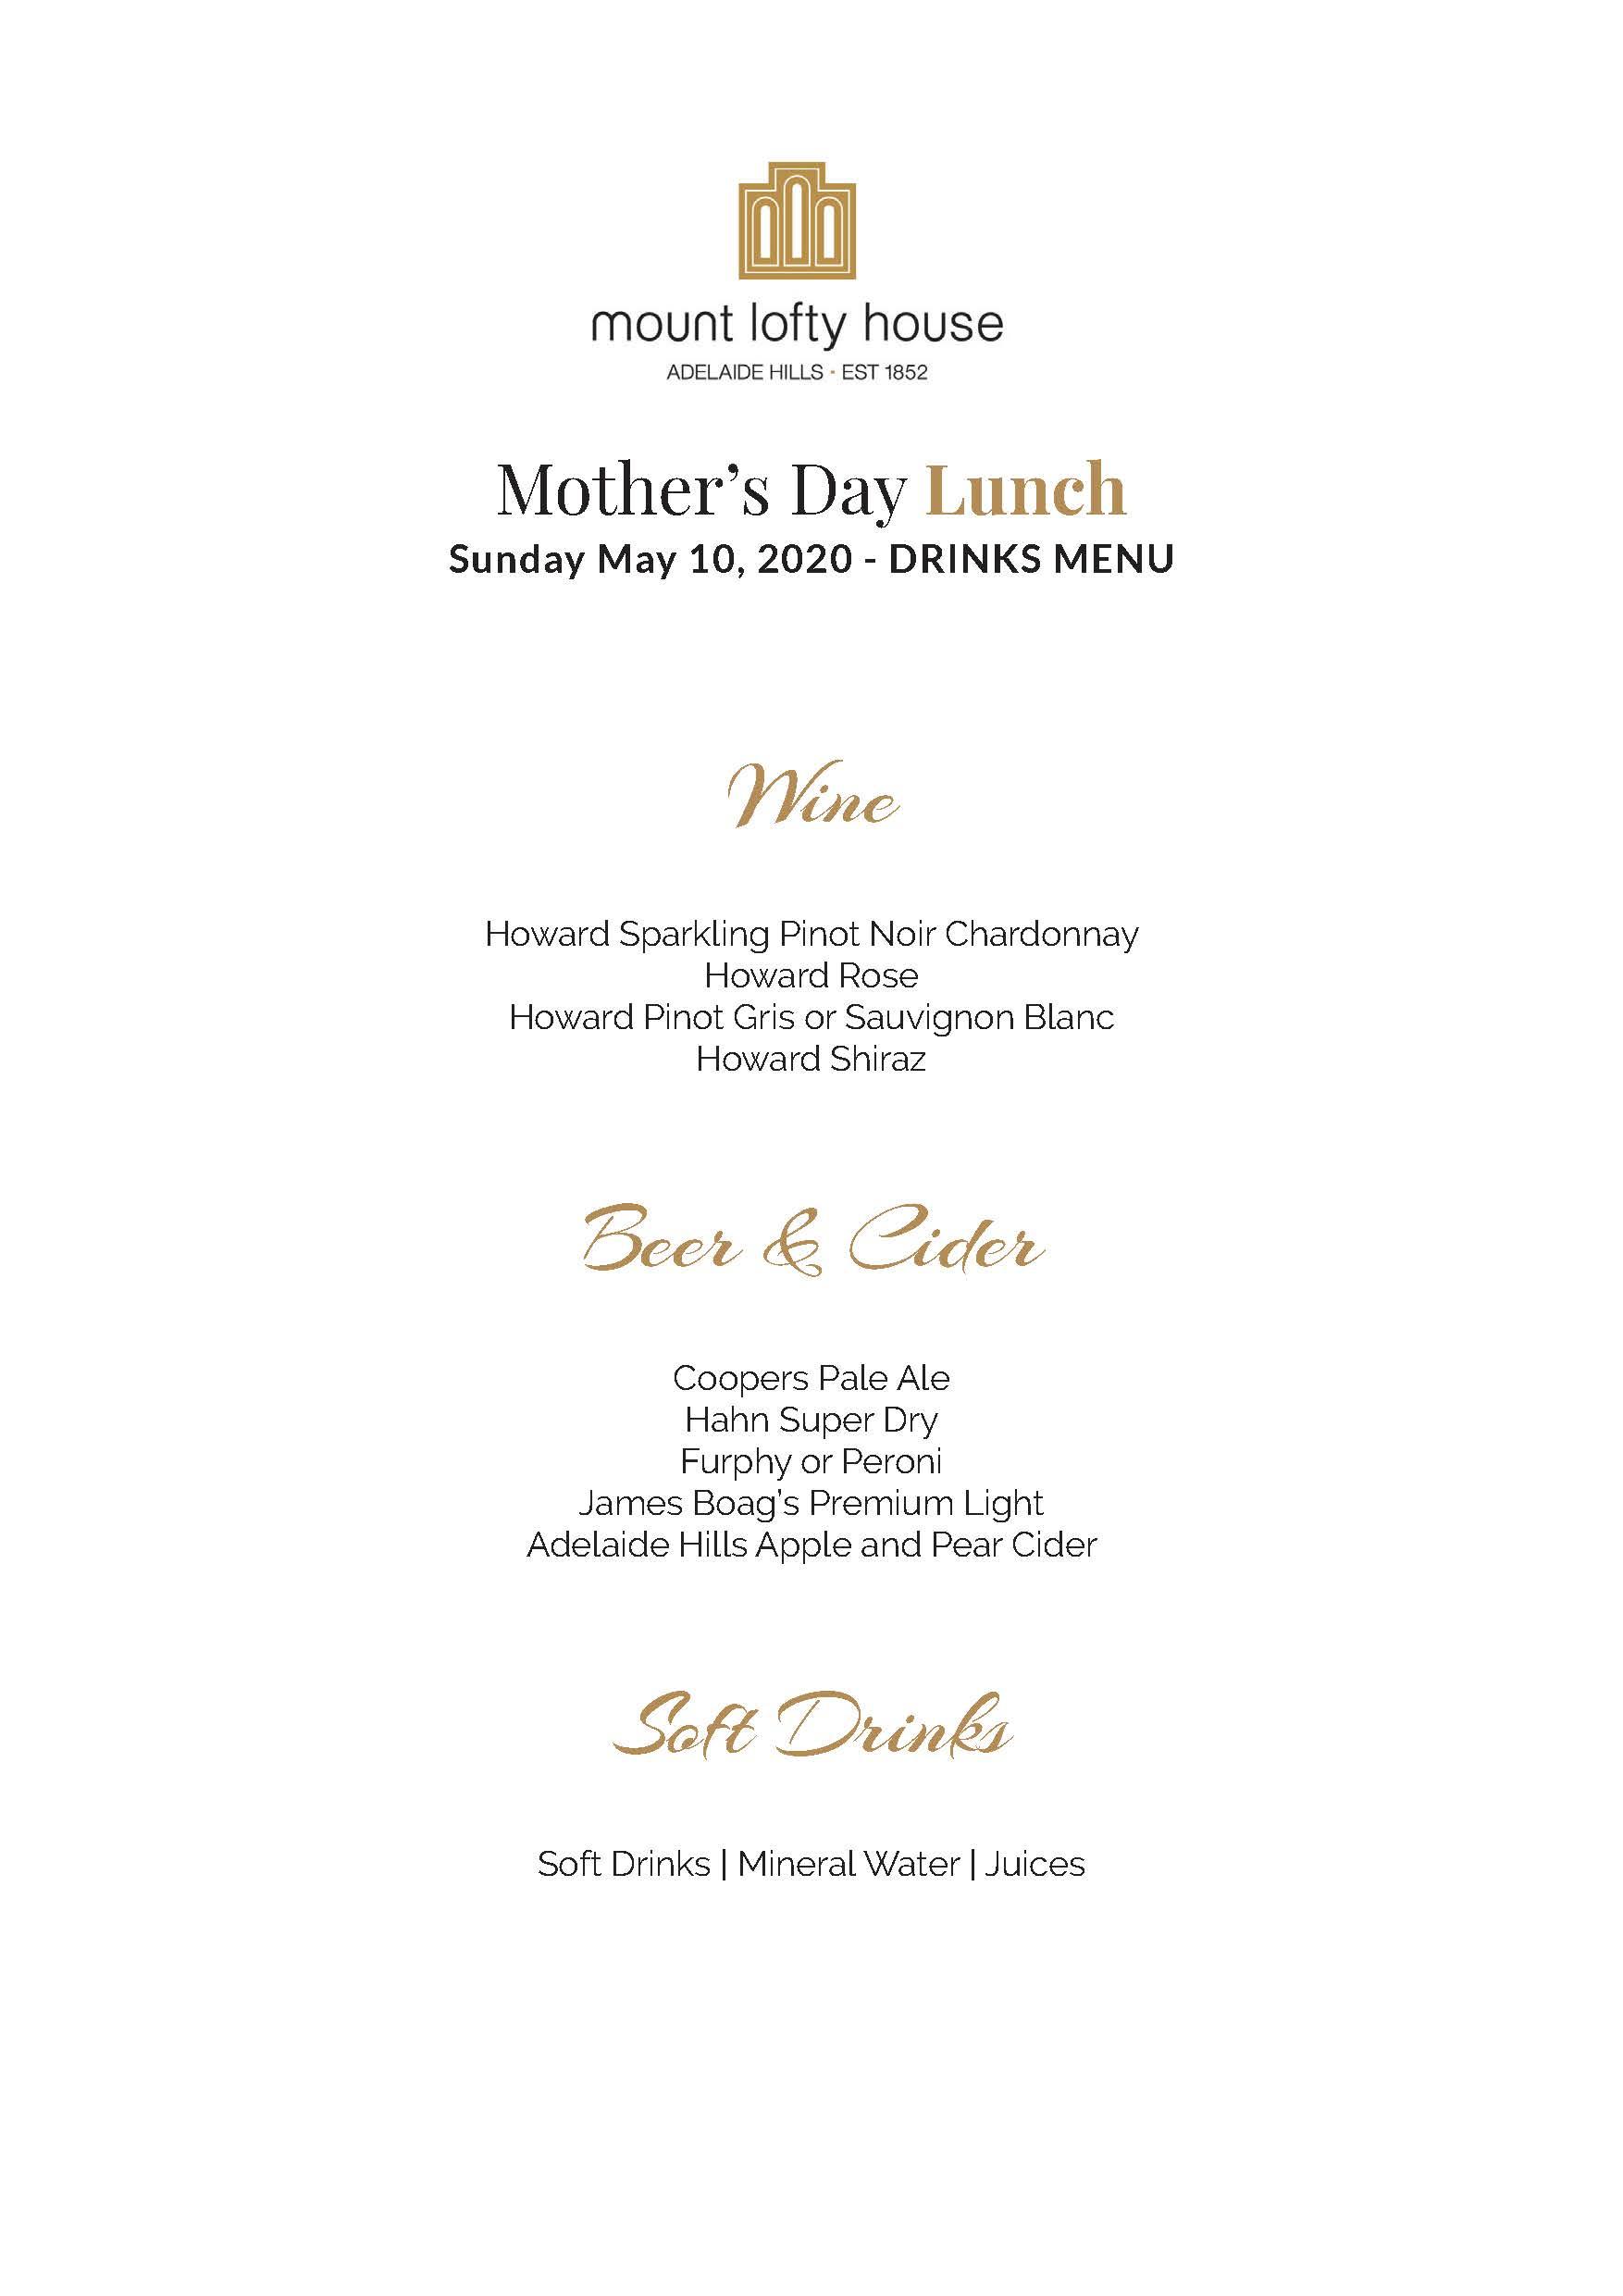 Mount Lofty House Mother's Day Premium Drinks Menu 2020